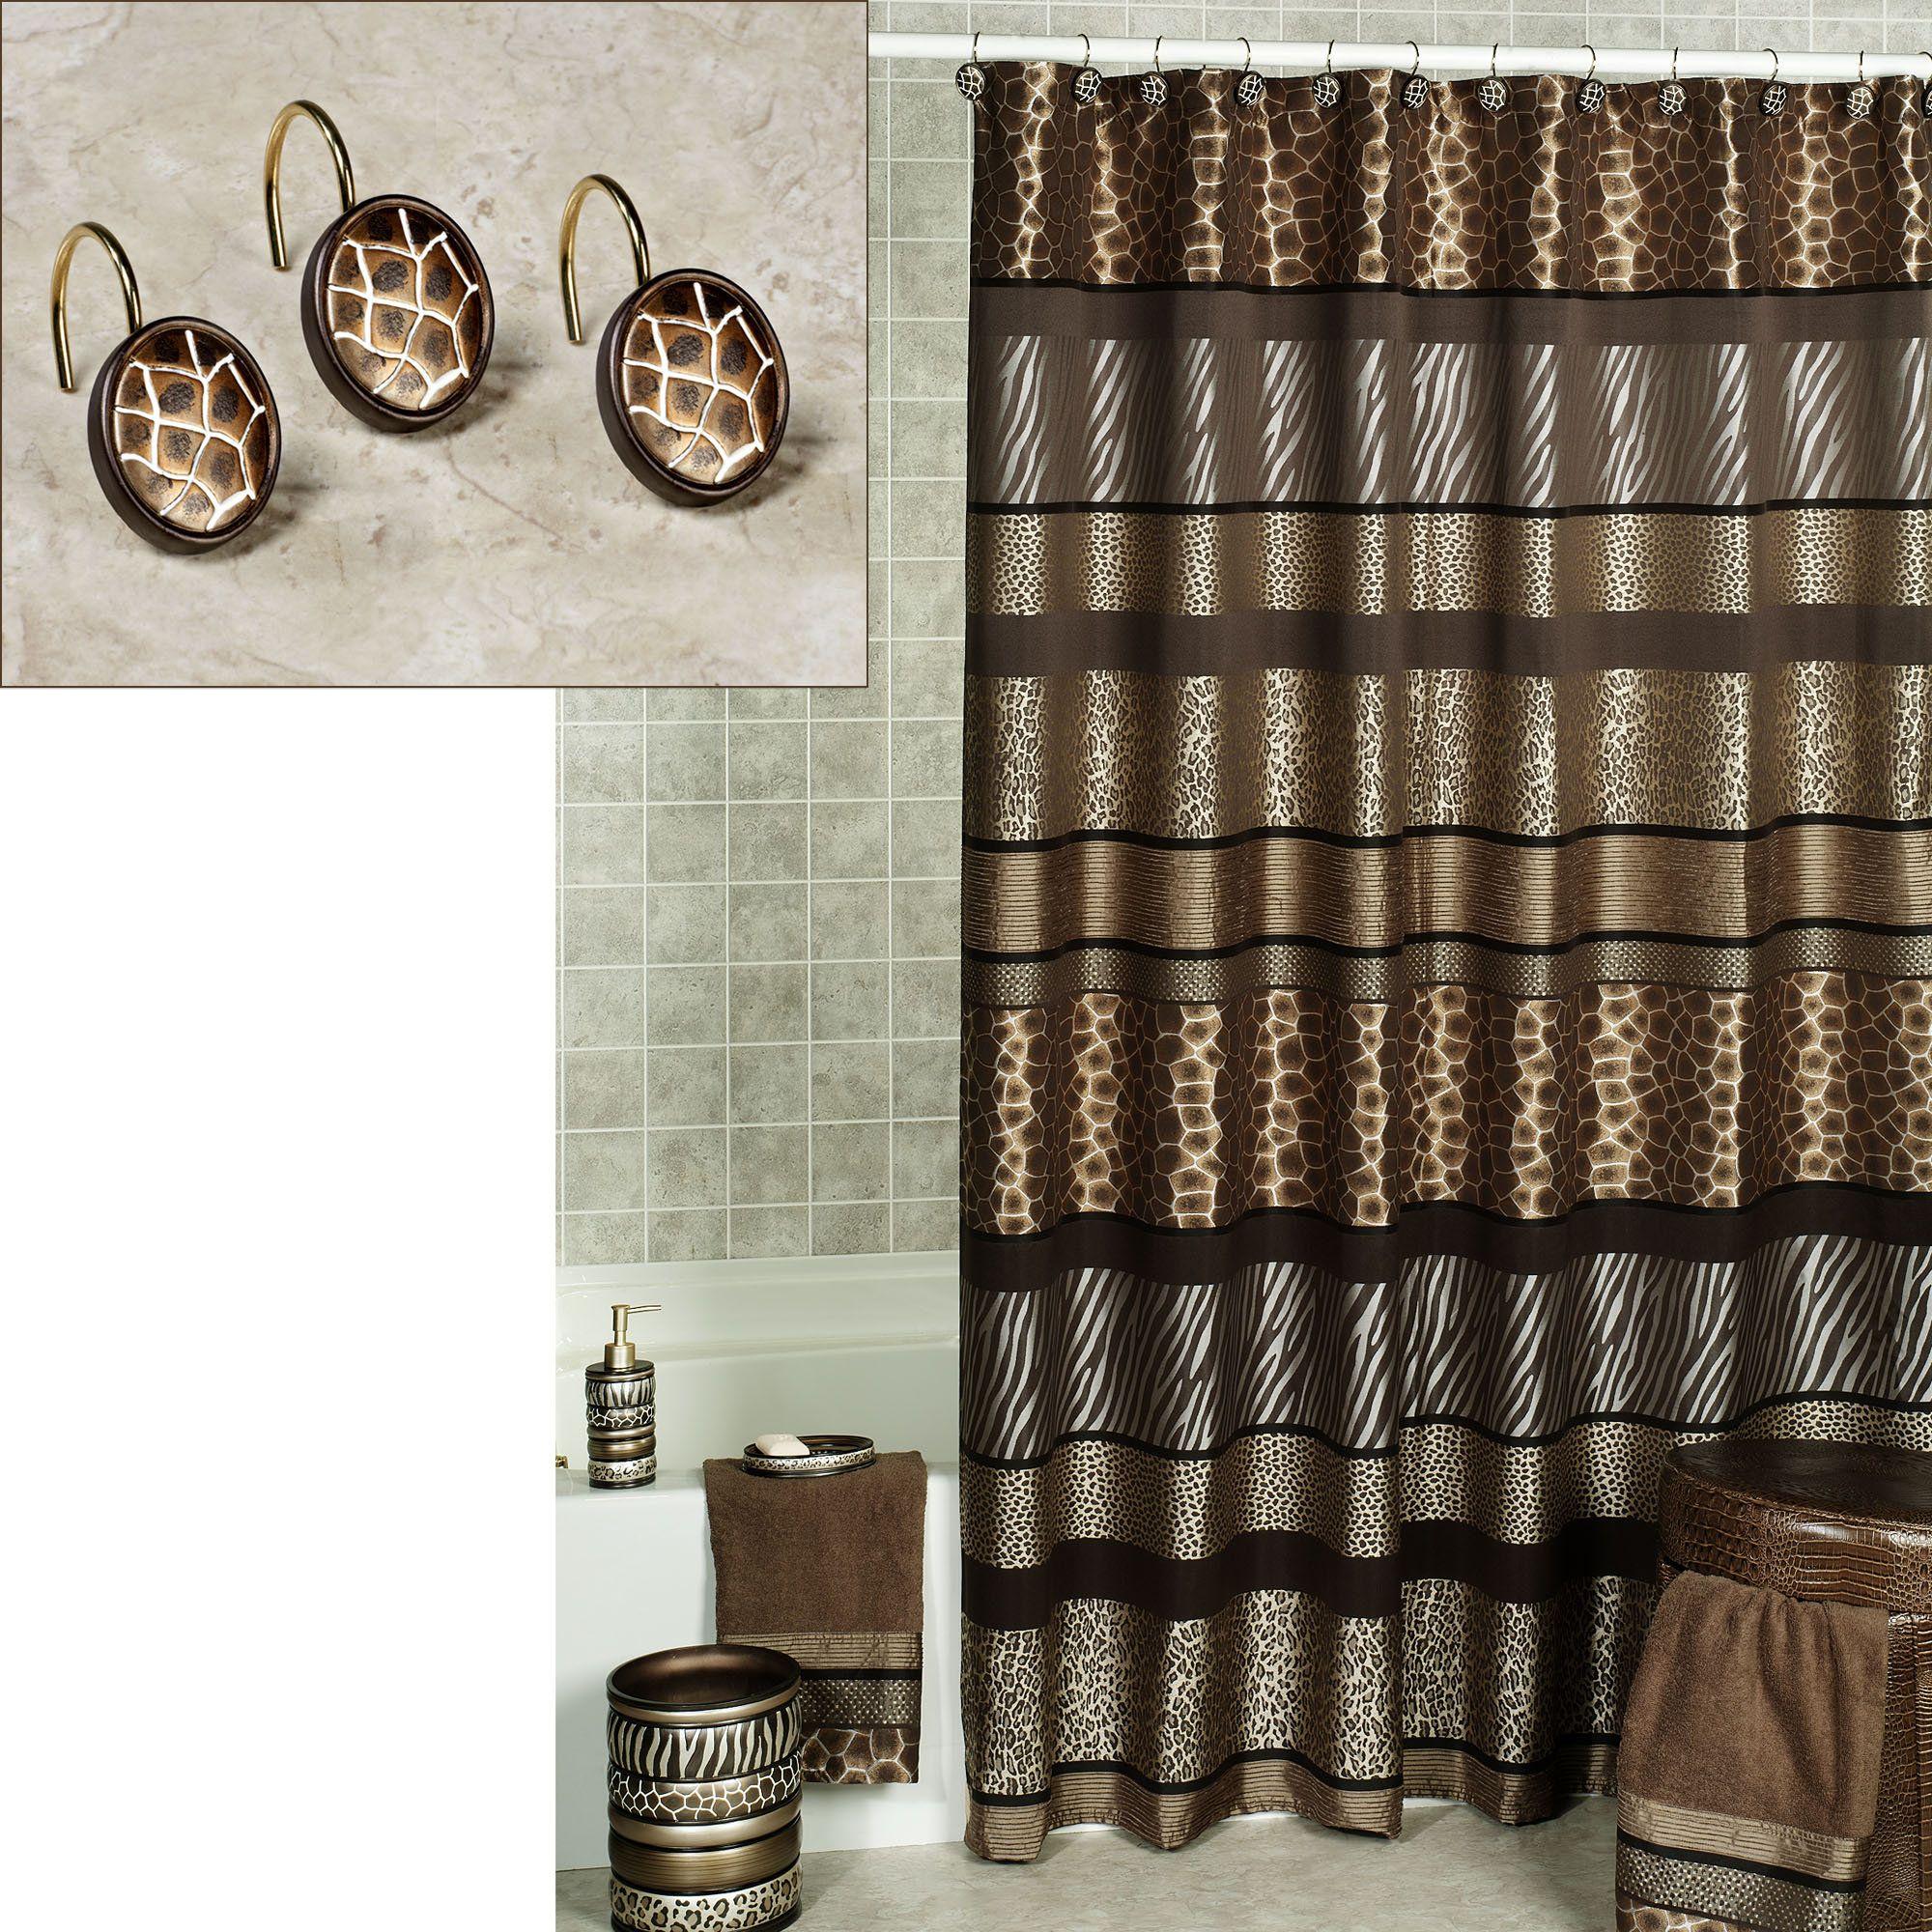 Leopard shower curtain - Safari Stripes Animal Print Shower Curtain